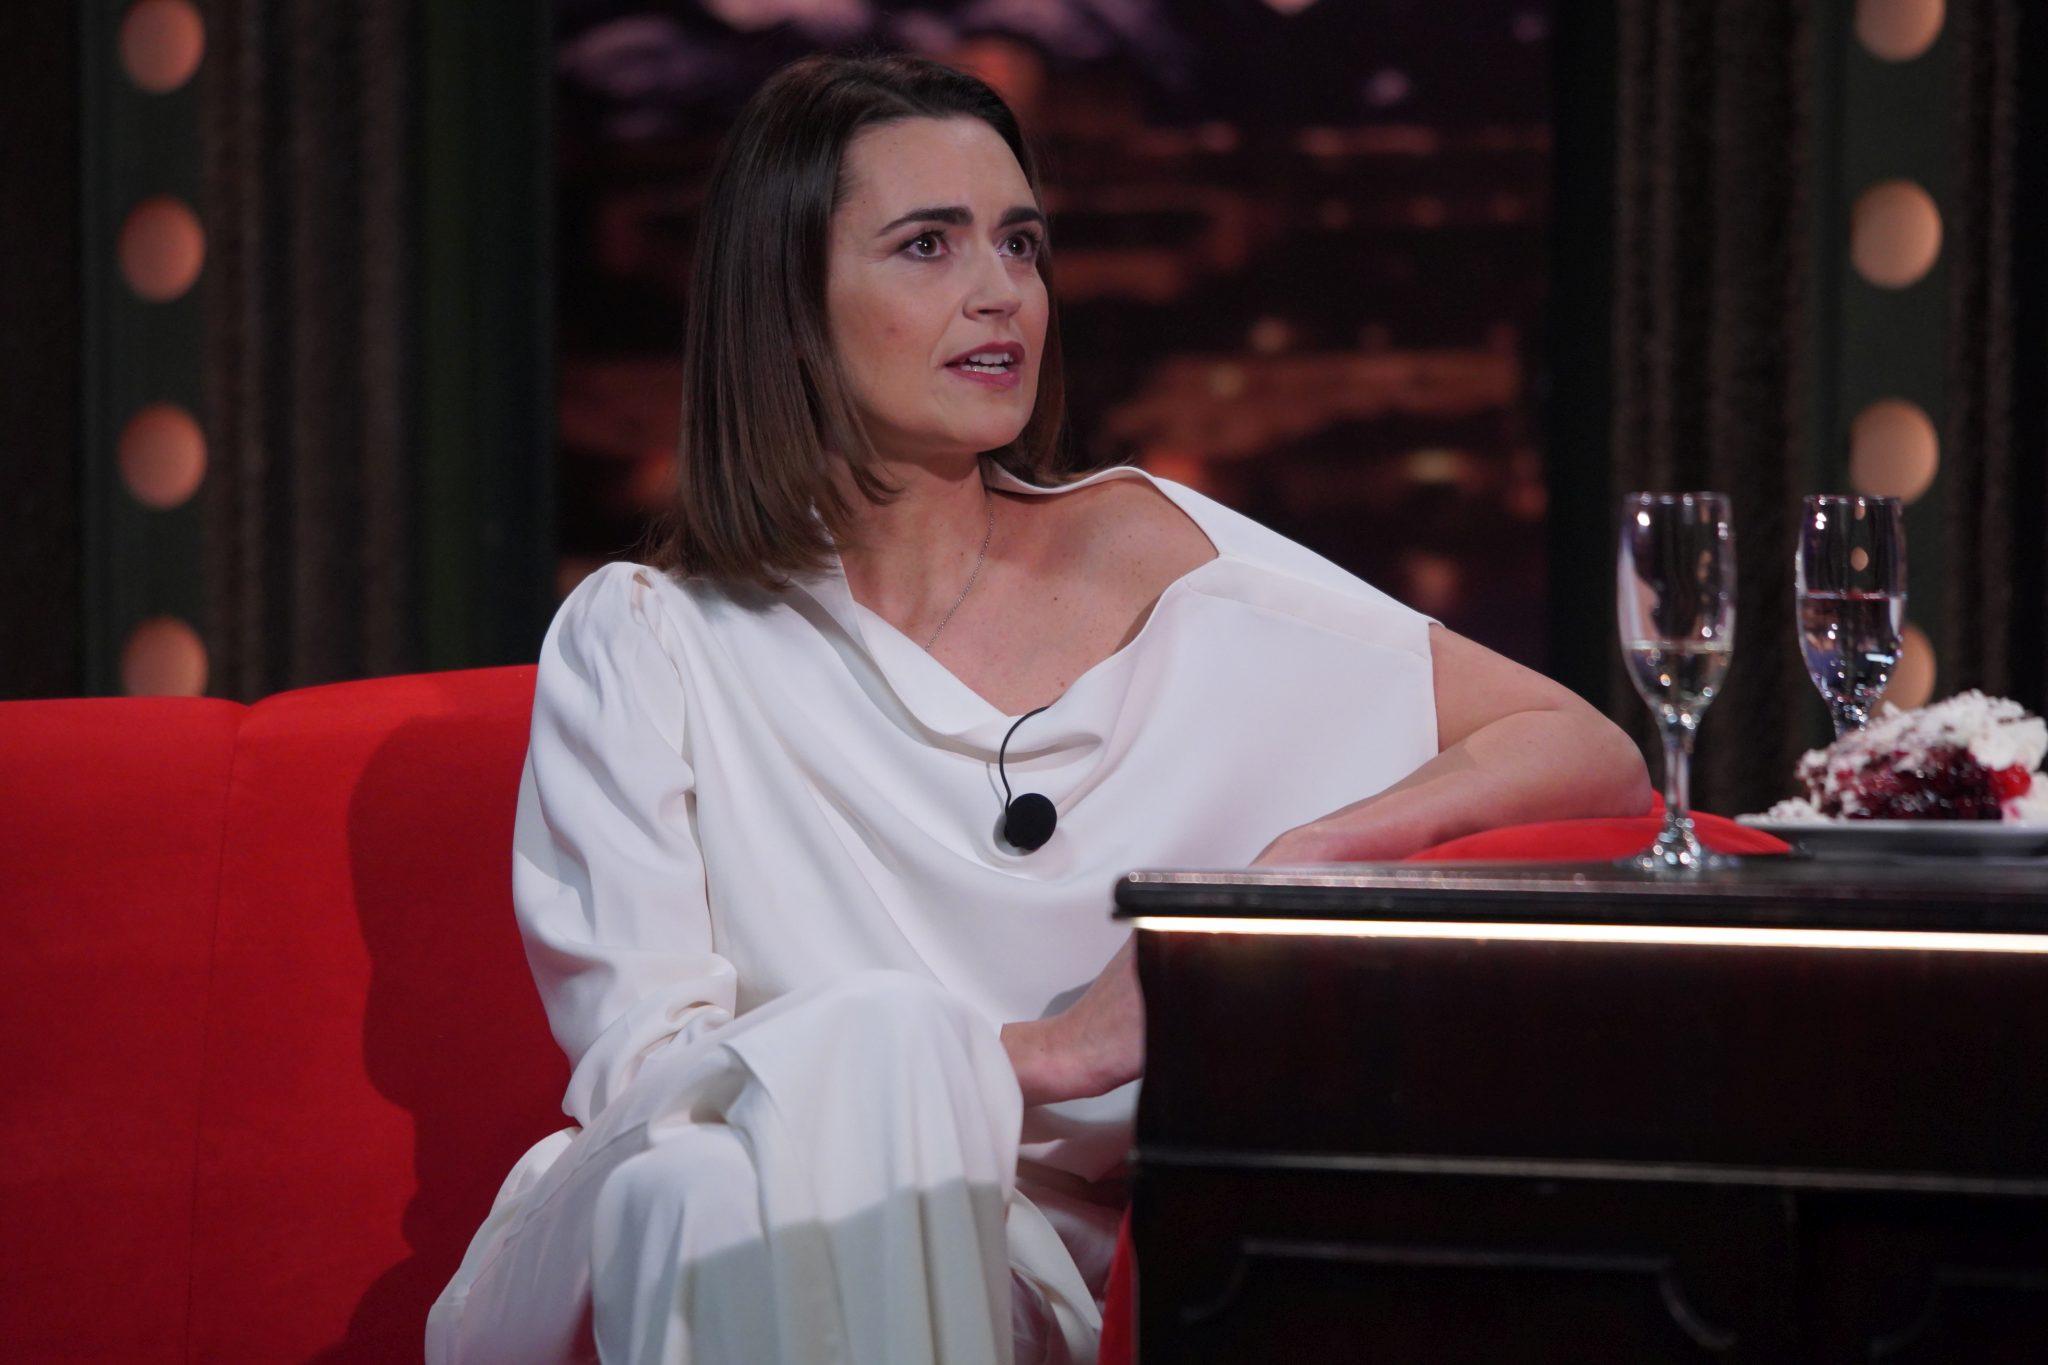 Televizní moderátorka a redaktorka Daniela Písařovicová v SJK 3. 2. 2021